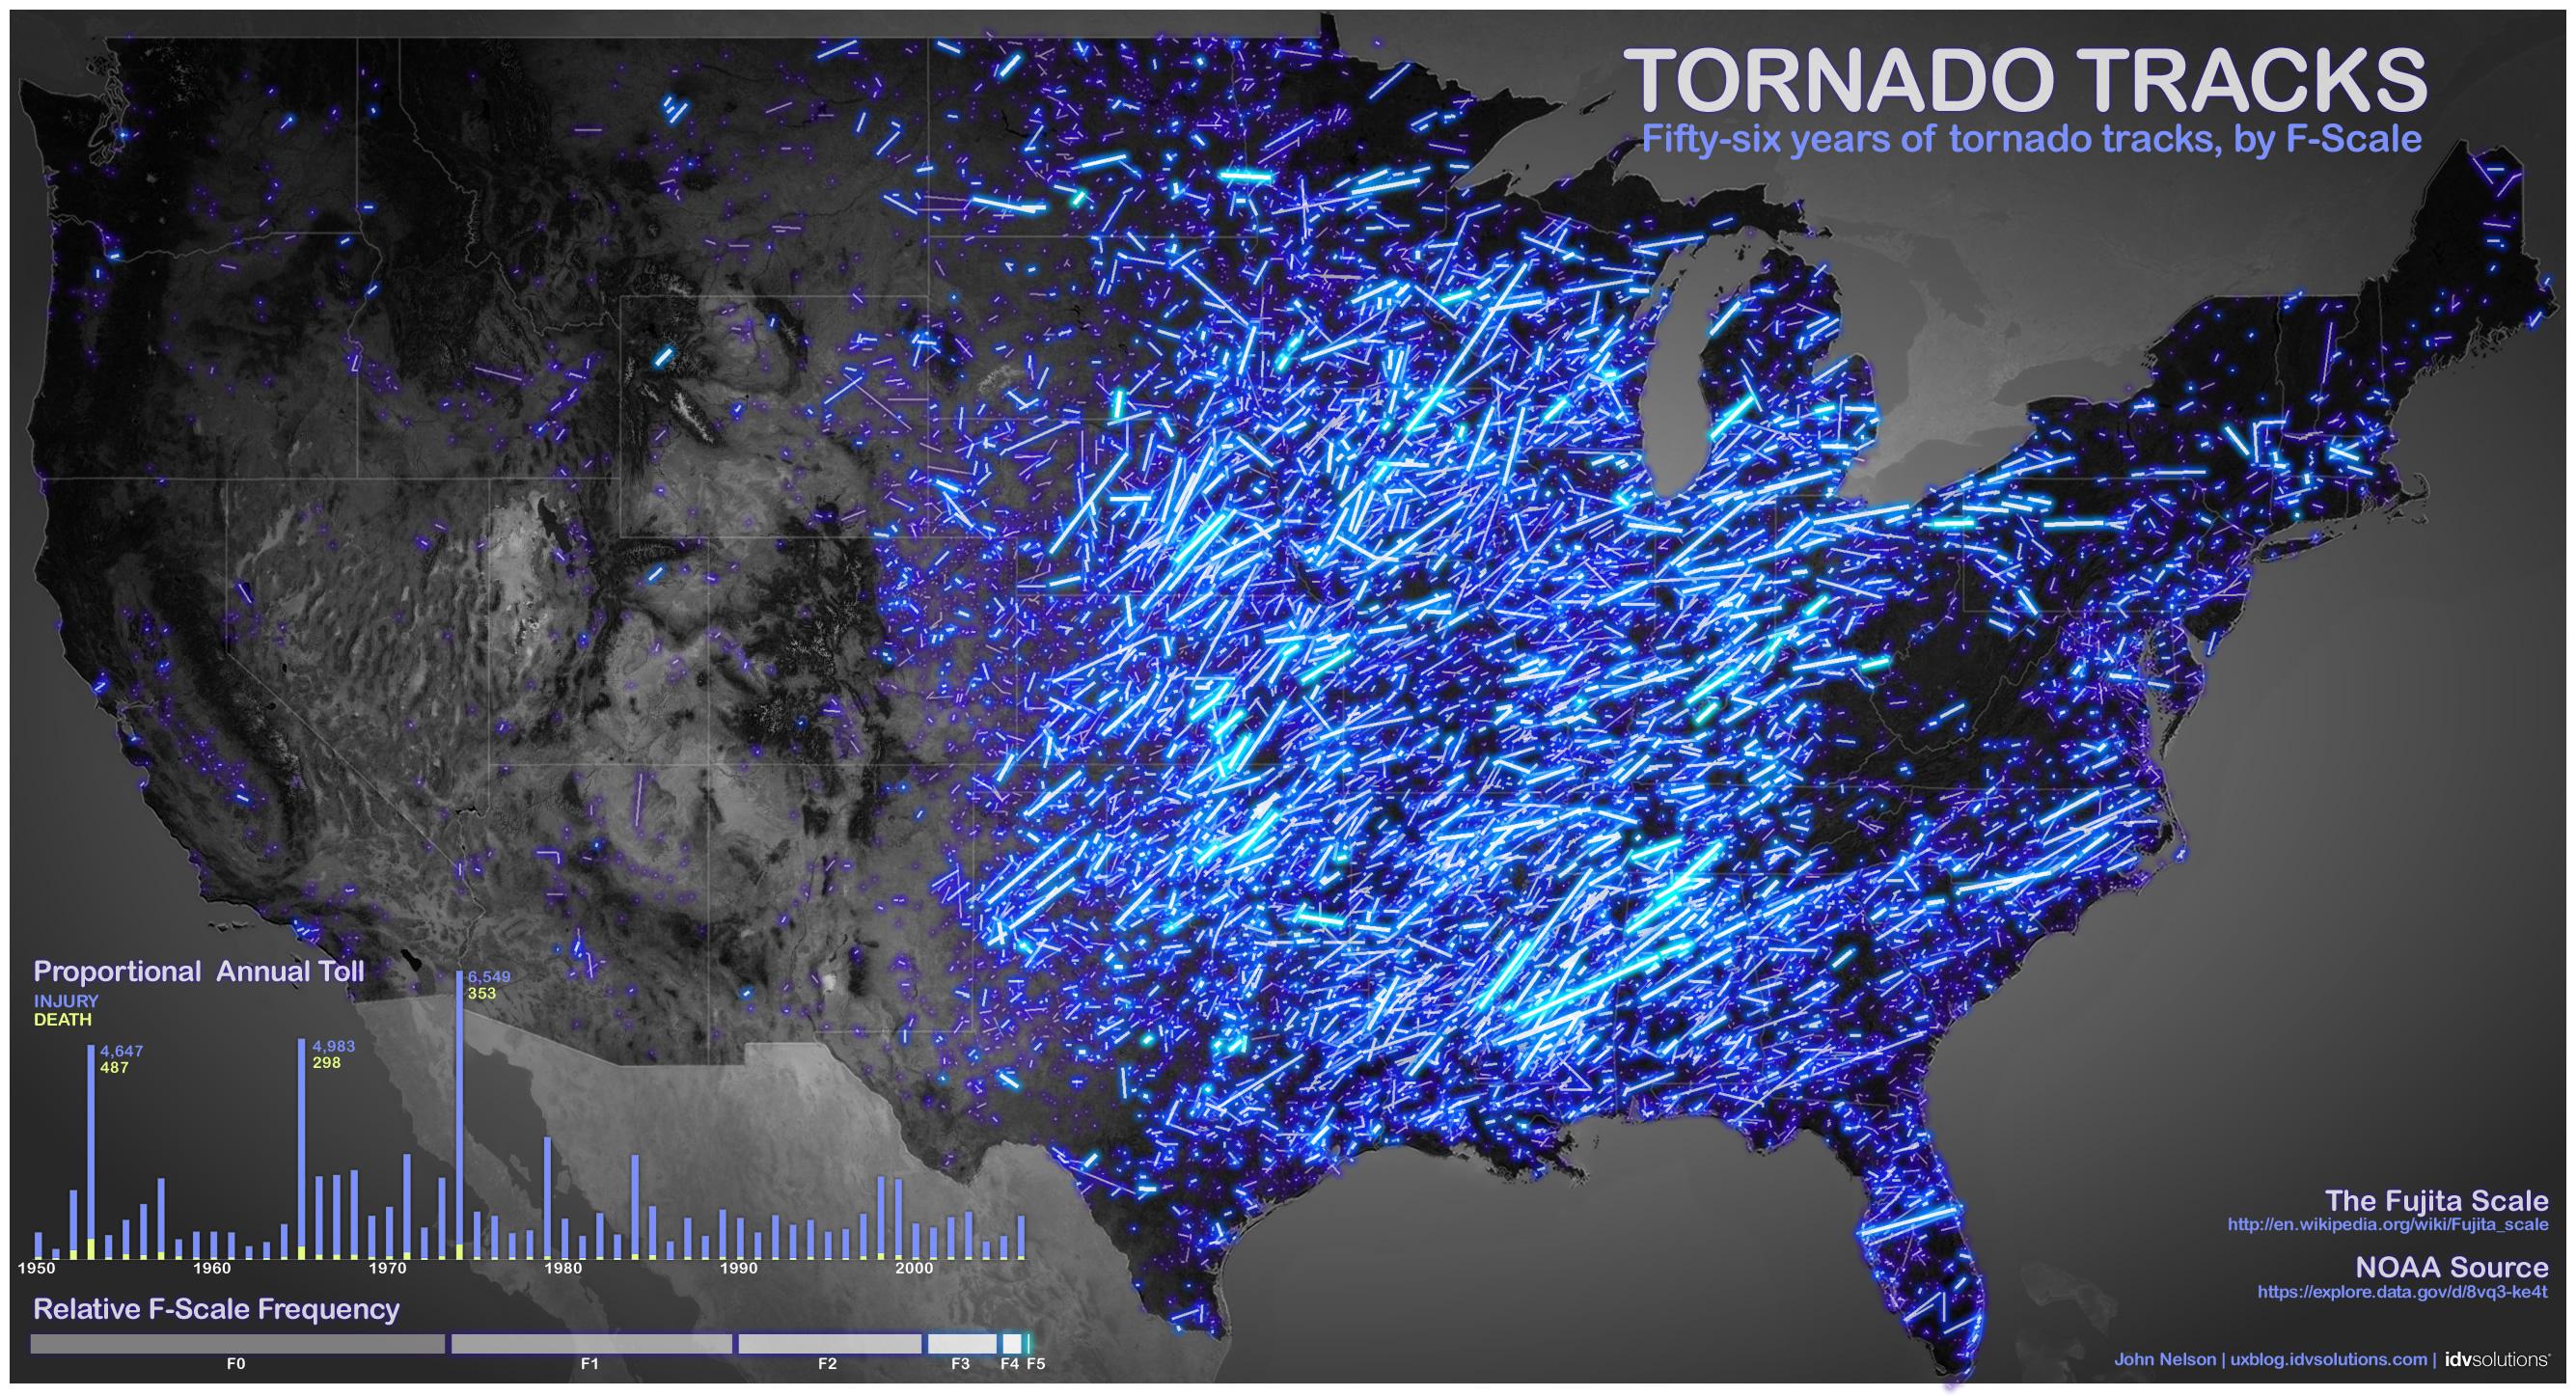 tornado_track_1347362652.jpg_2670x1447